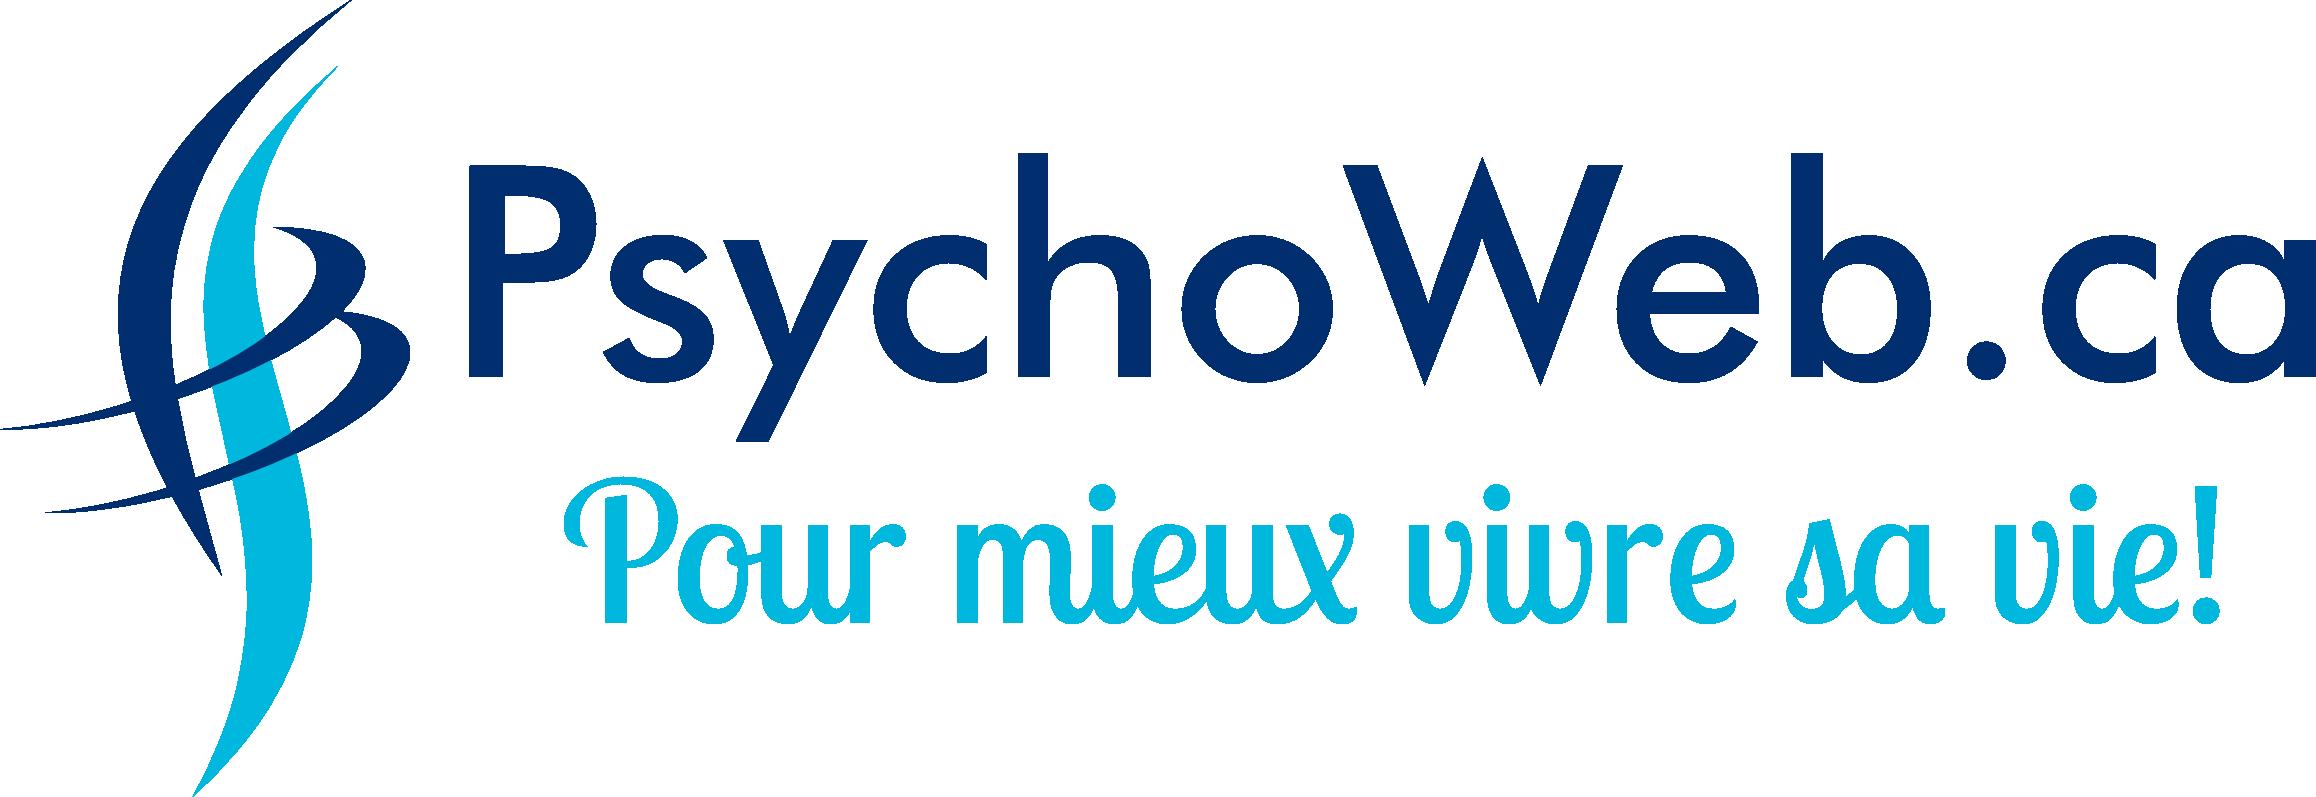 PsychoWeb.ca